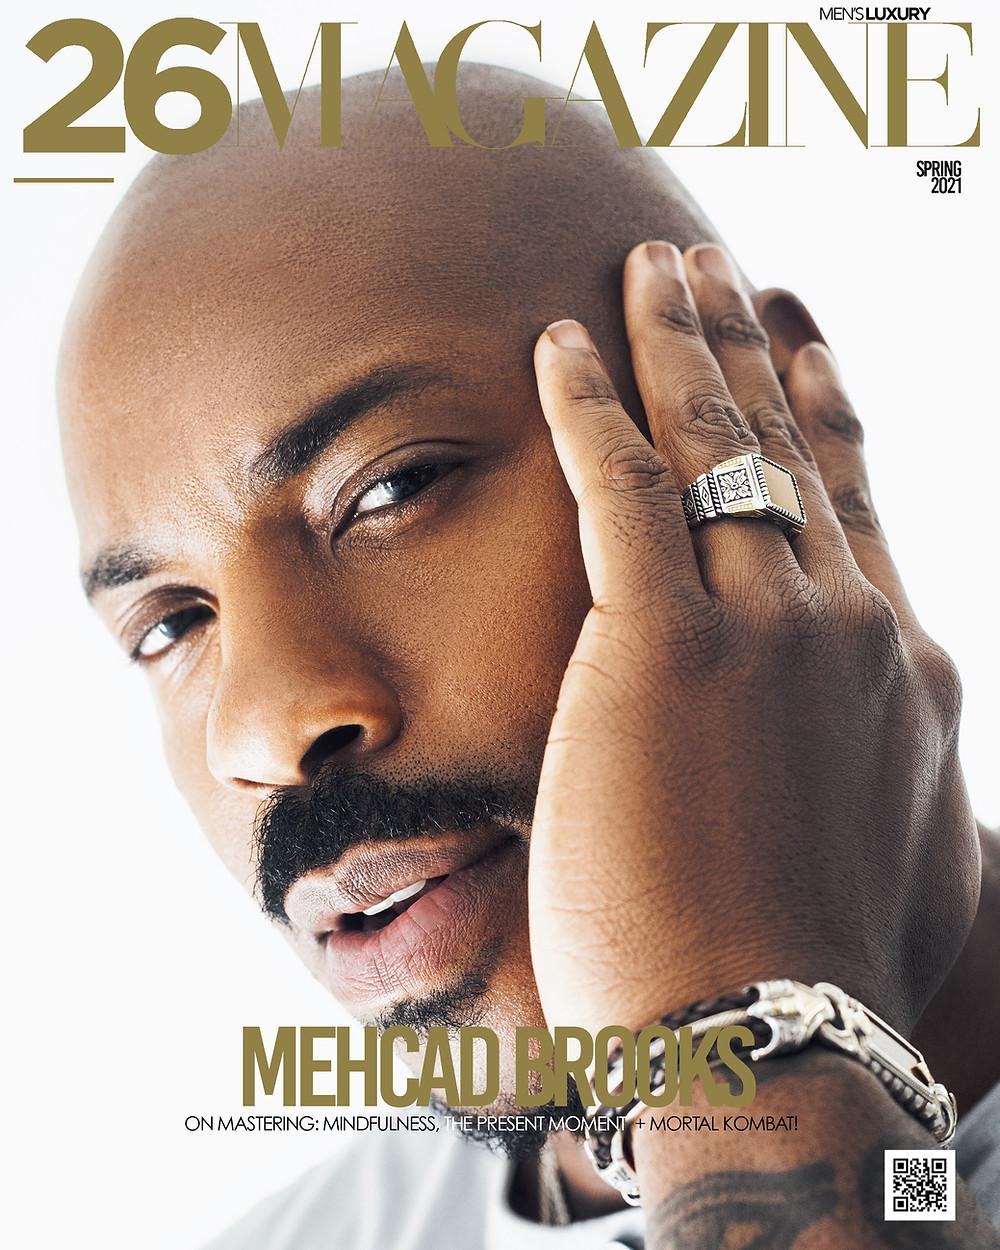 26 Magazine Mehcad Brooks